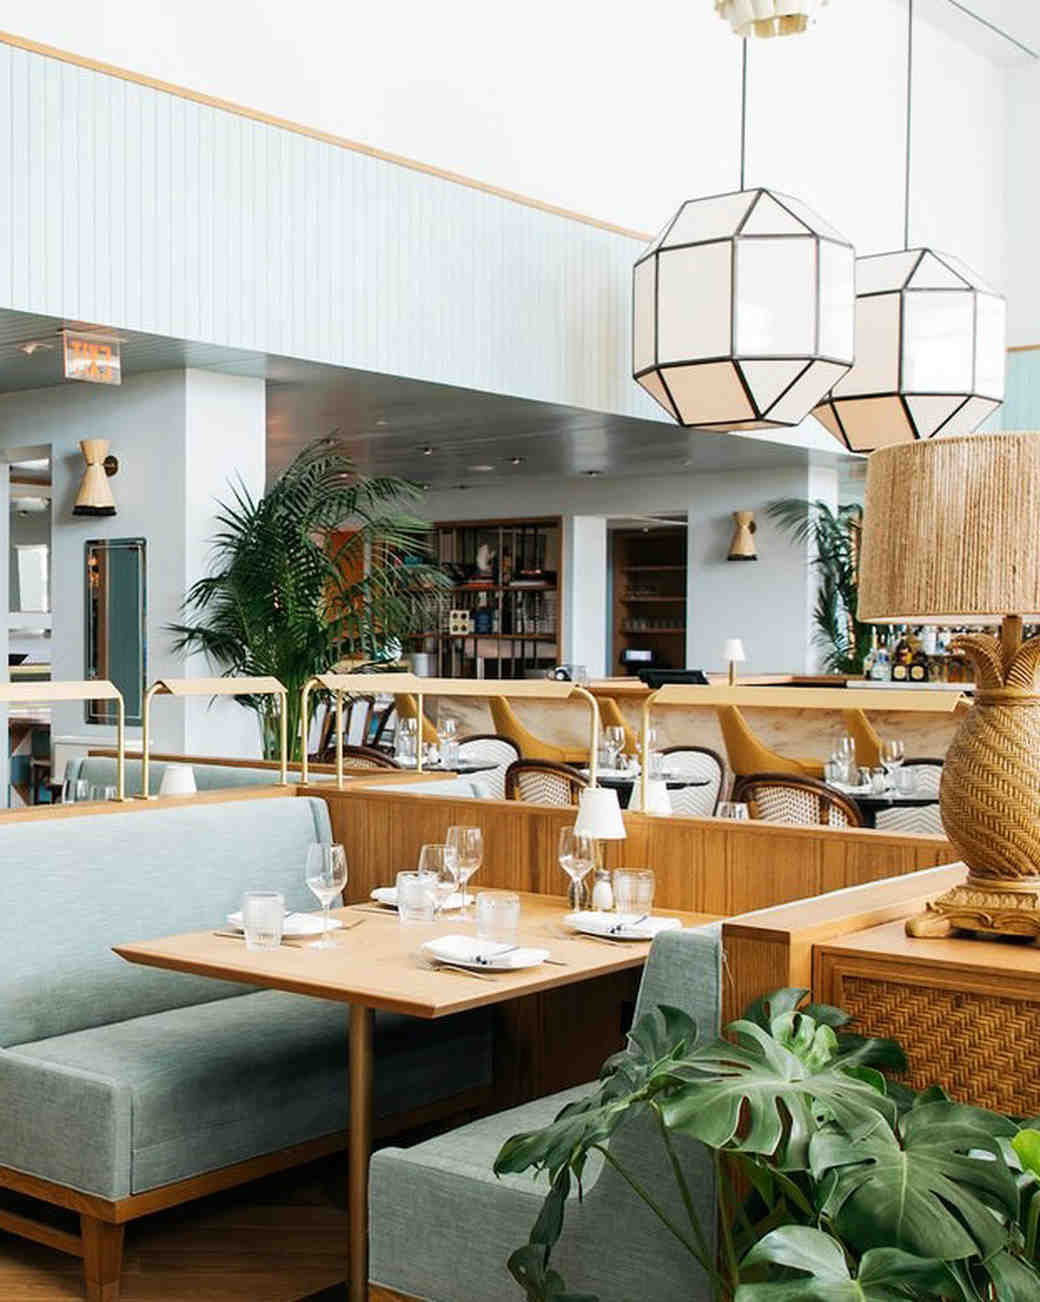 new venue indoor seating restaurant space